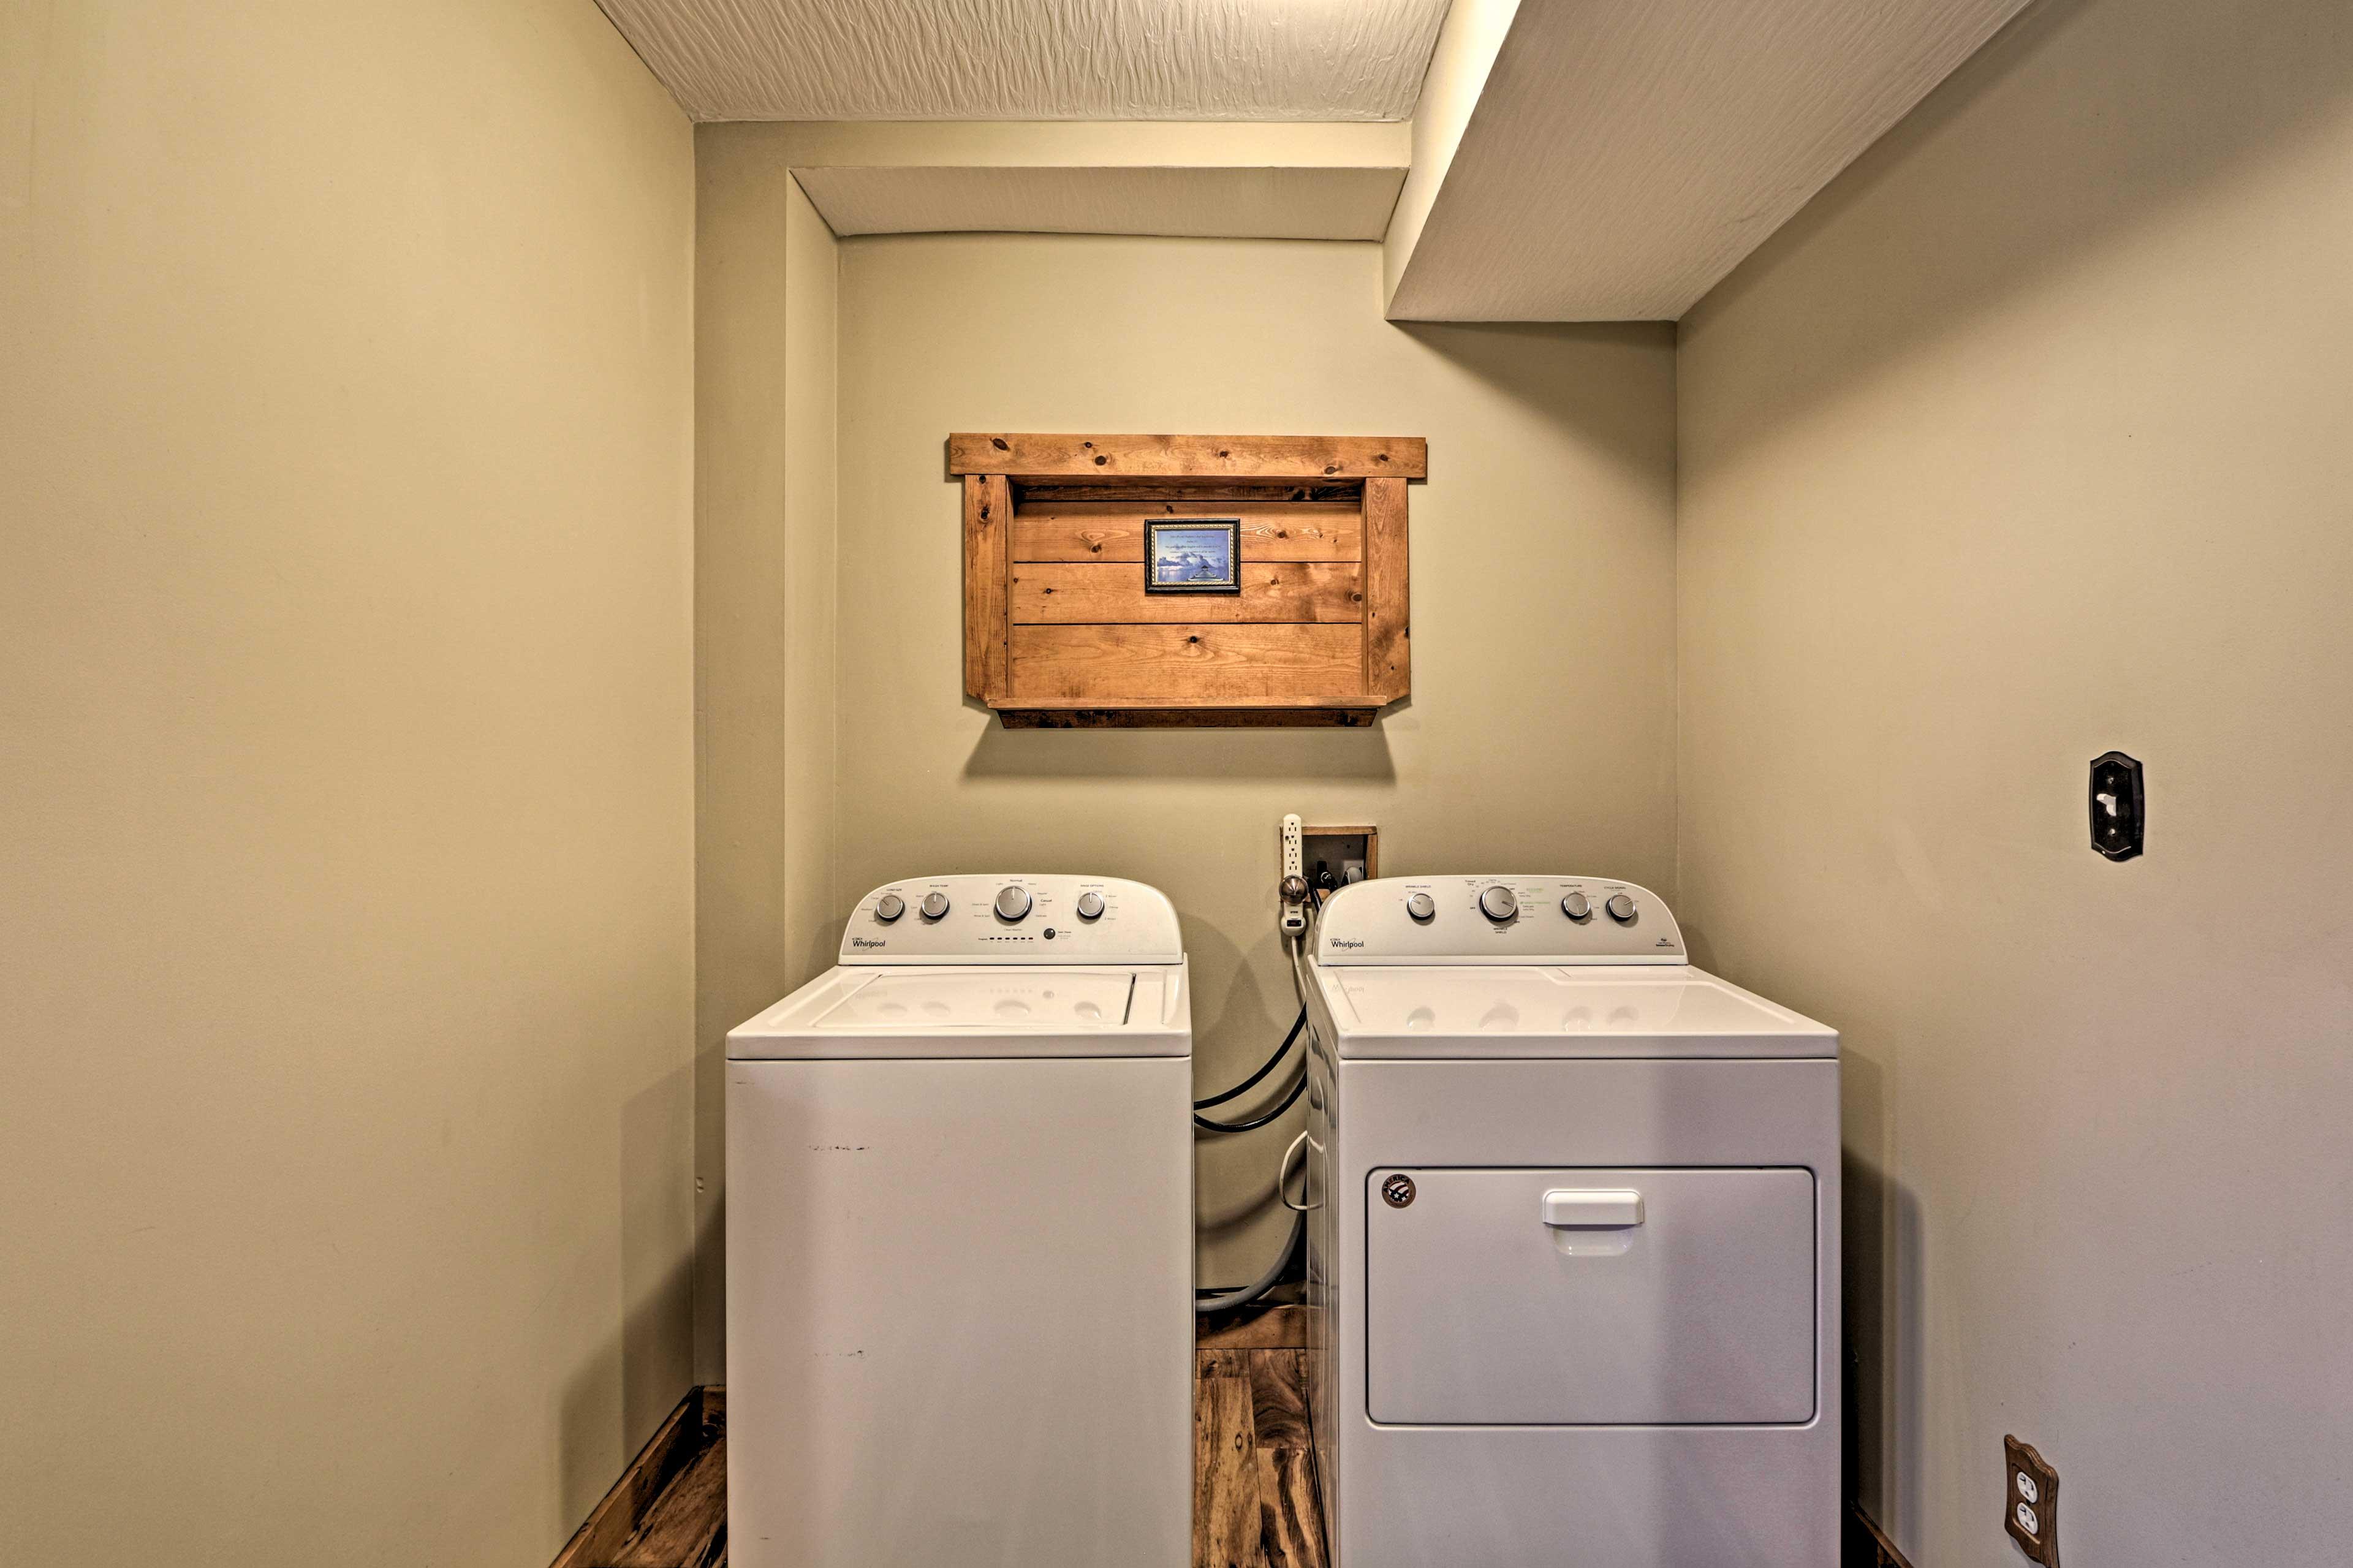 Laundry Room | Laundry Detergent